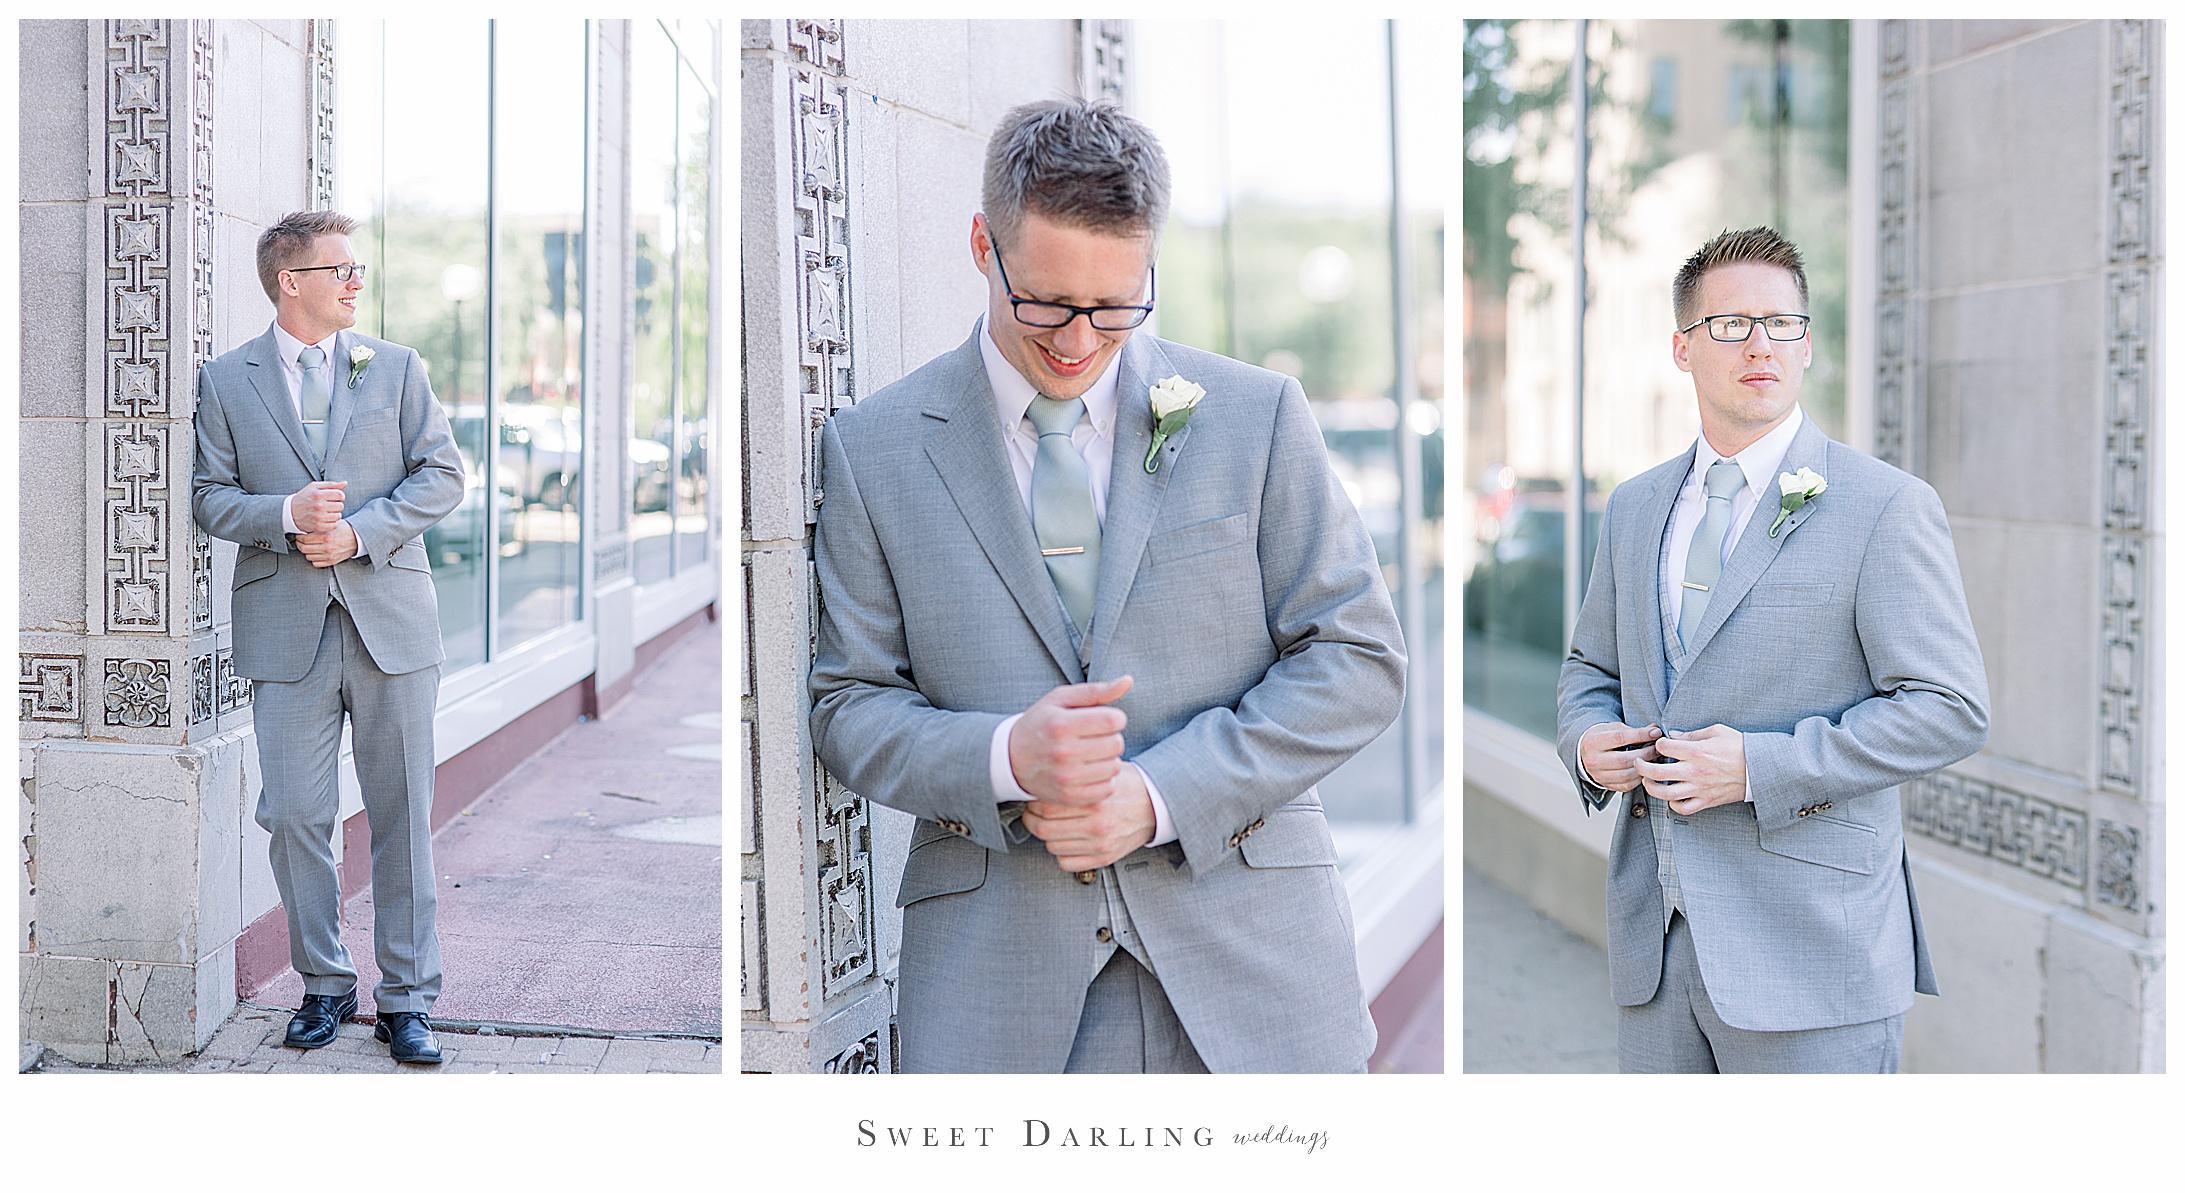 champaign-illinois-boho-summer-wedding-photographer-city-center-sweet-darling-weddings_2330.jpg